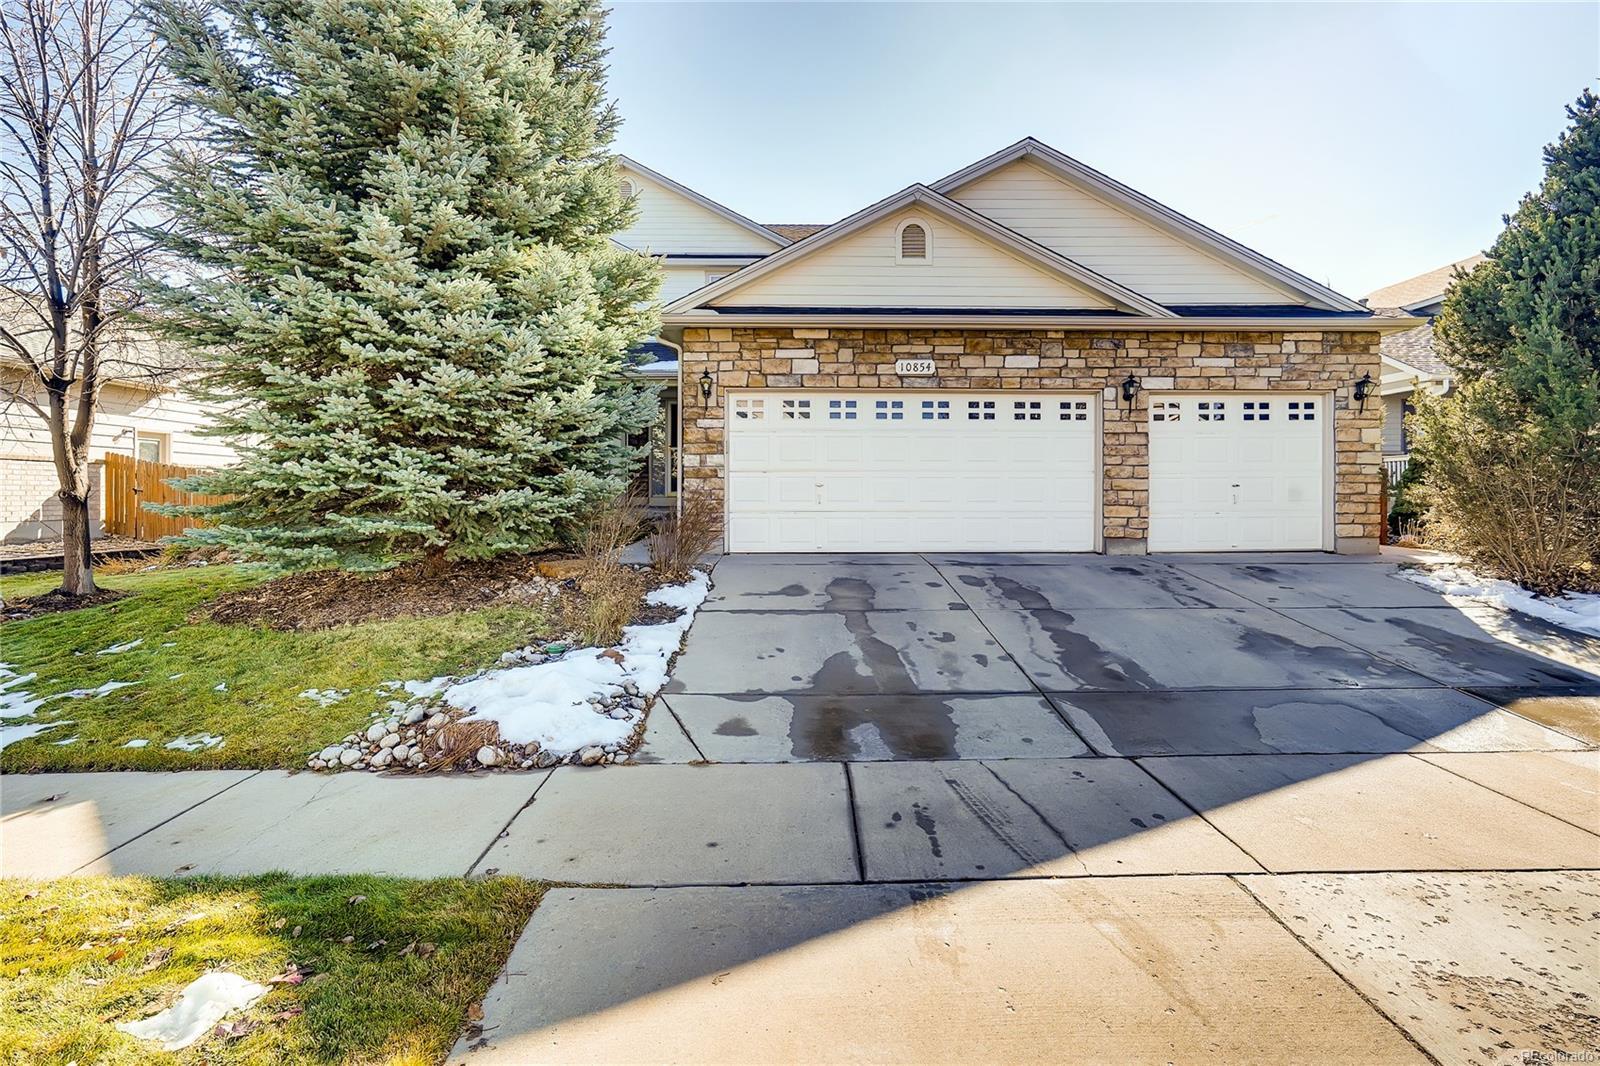 10854 W 54th Lane, Arvada, CO 80002 - Arvada, CO real estate listing